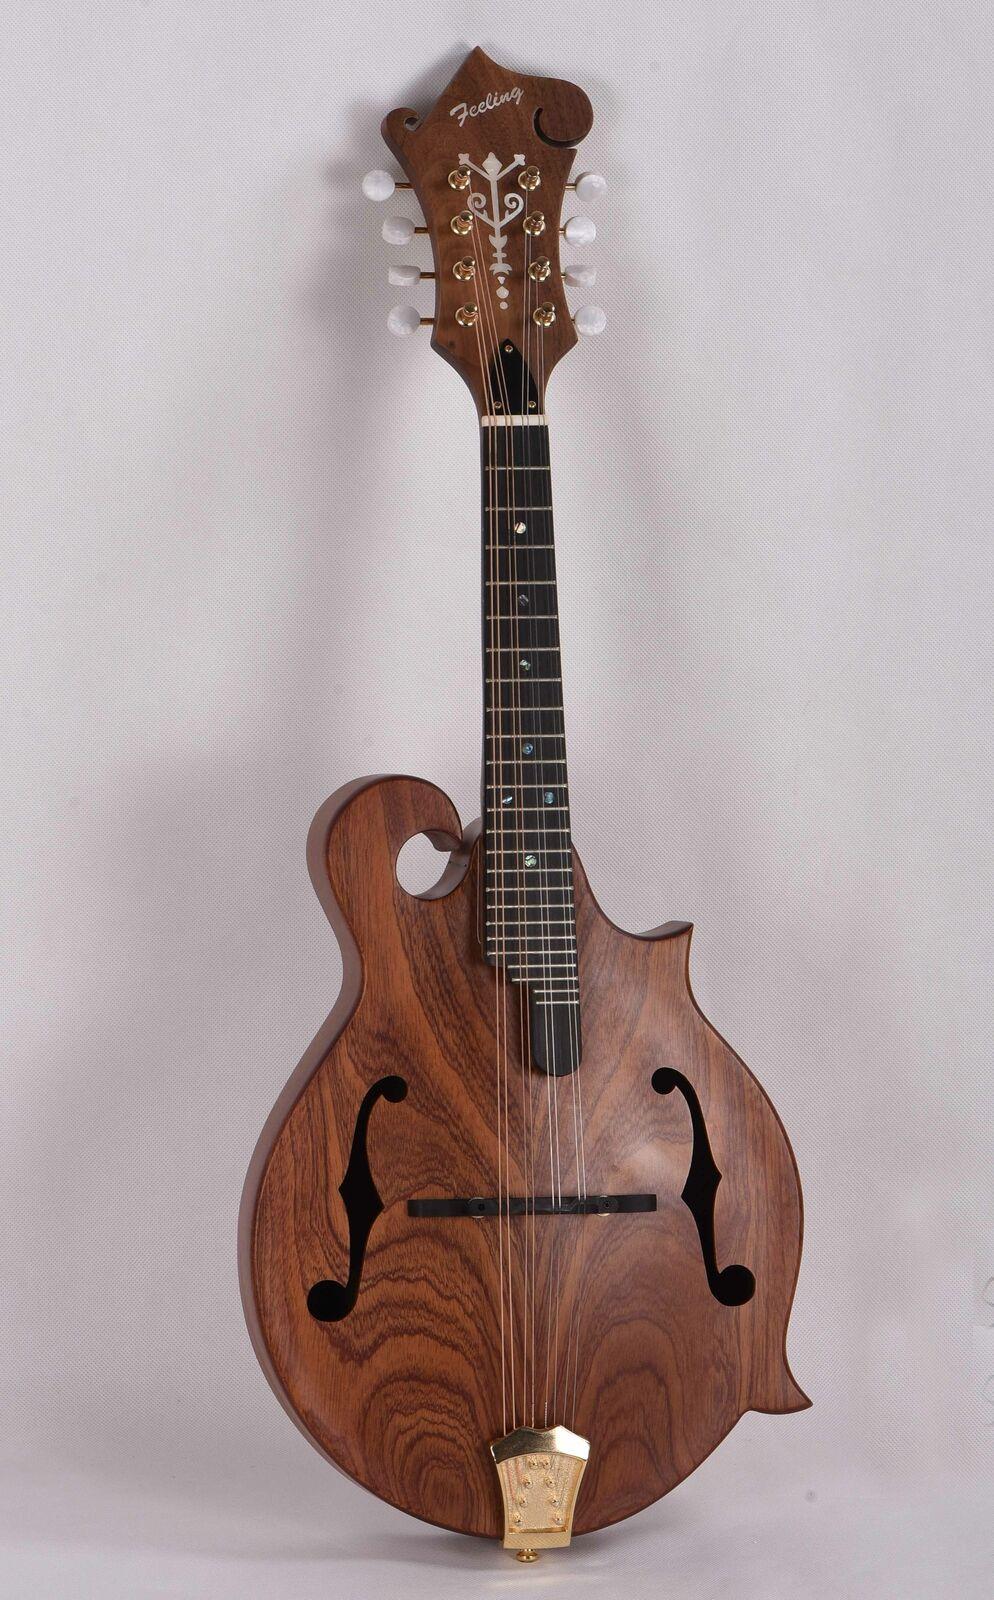 Feeling Handmade F Stil Mandoline, S86, Solid Mahagoni Top,Free shipping